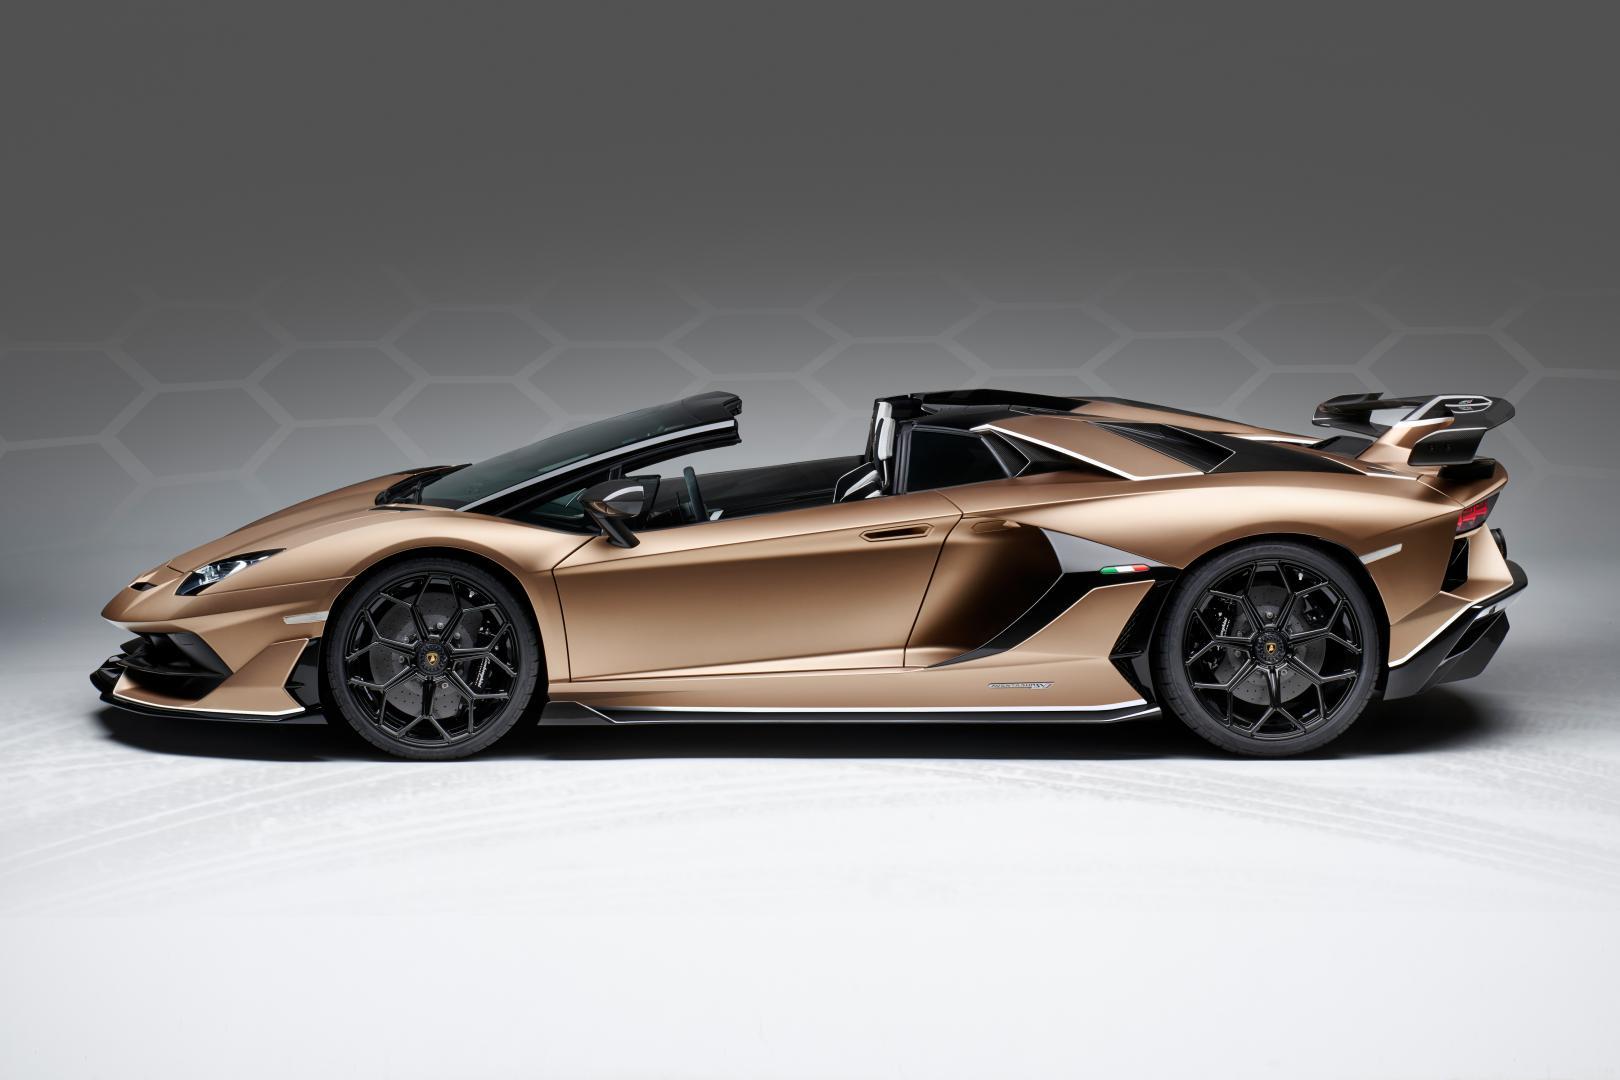 Lamborghini Aventador SVJ Roadster 2019